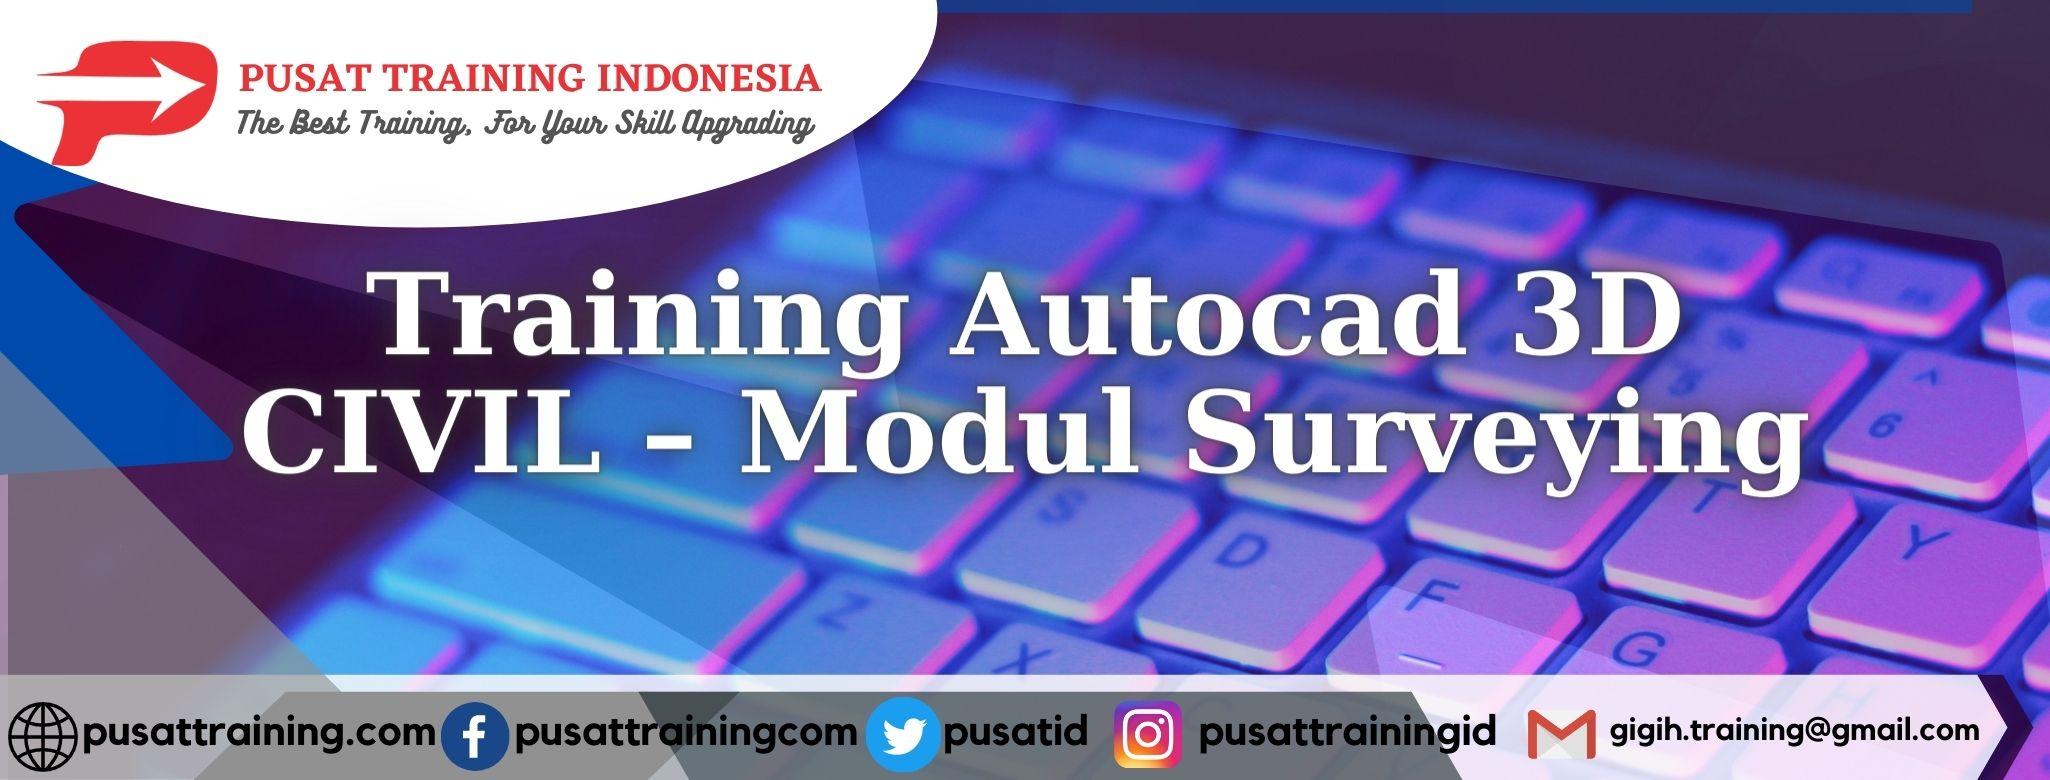 Training-Autocad-3D-CIVIL-Modul-Surveying